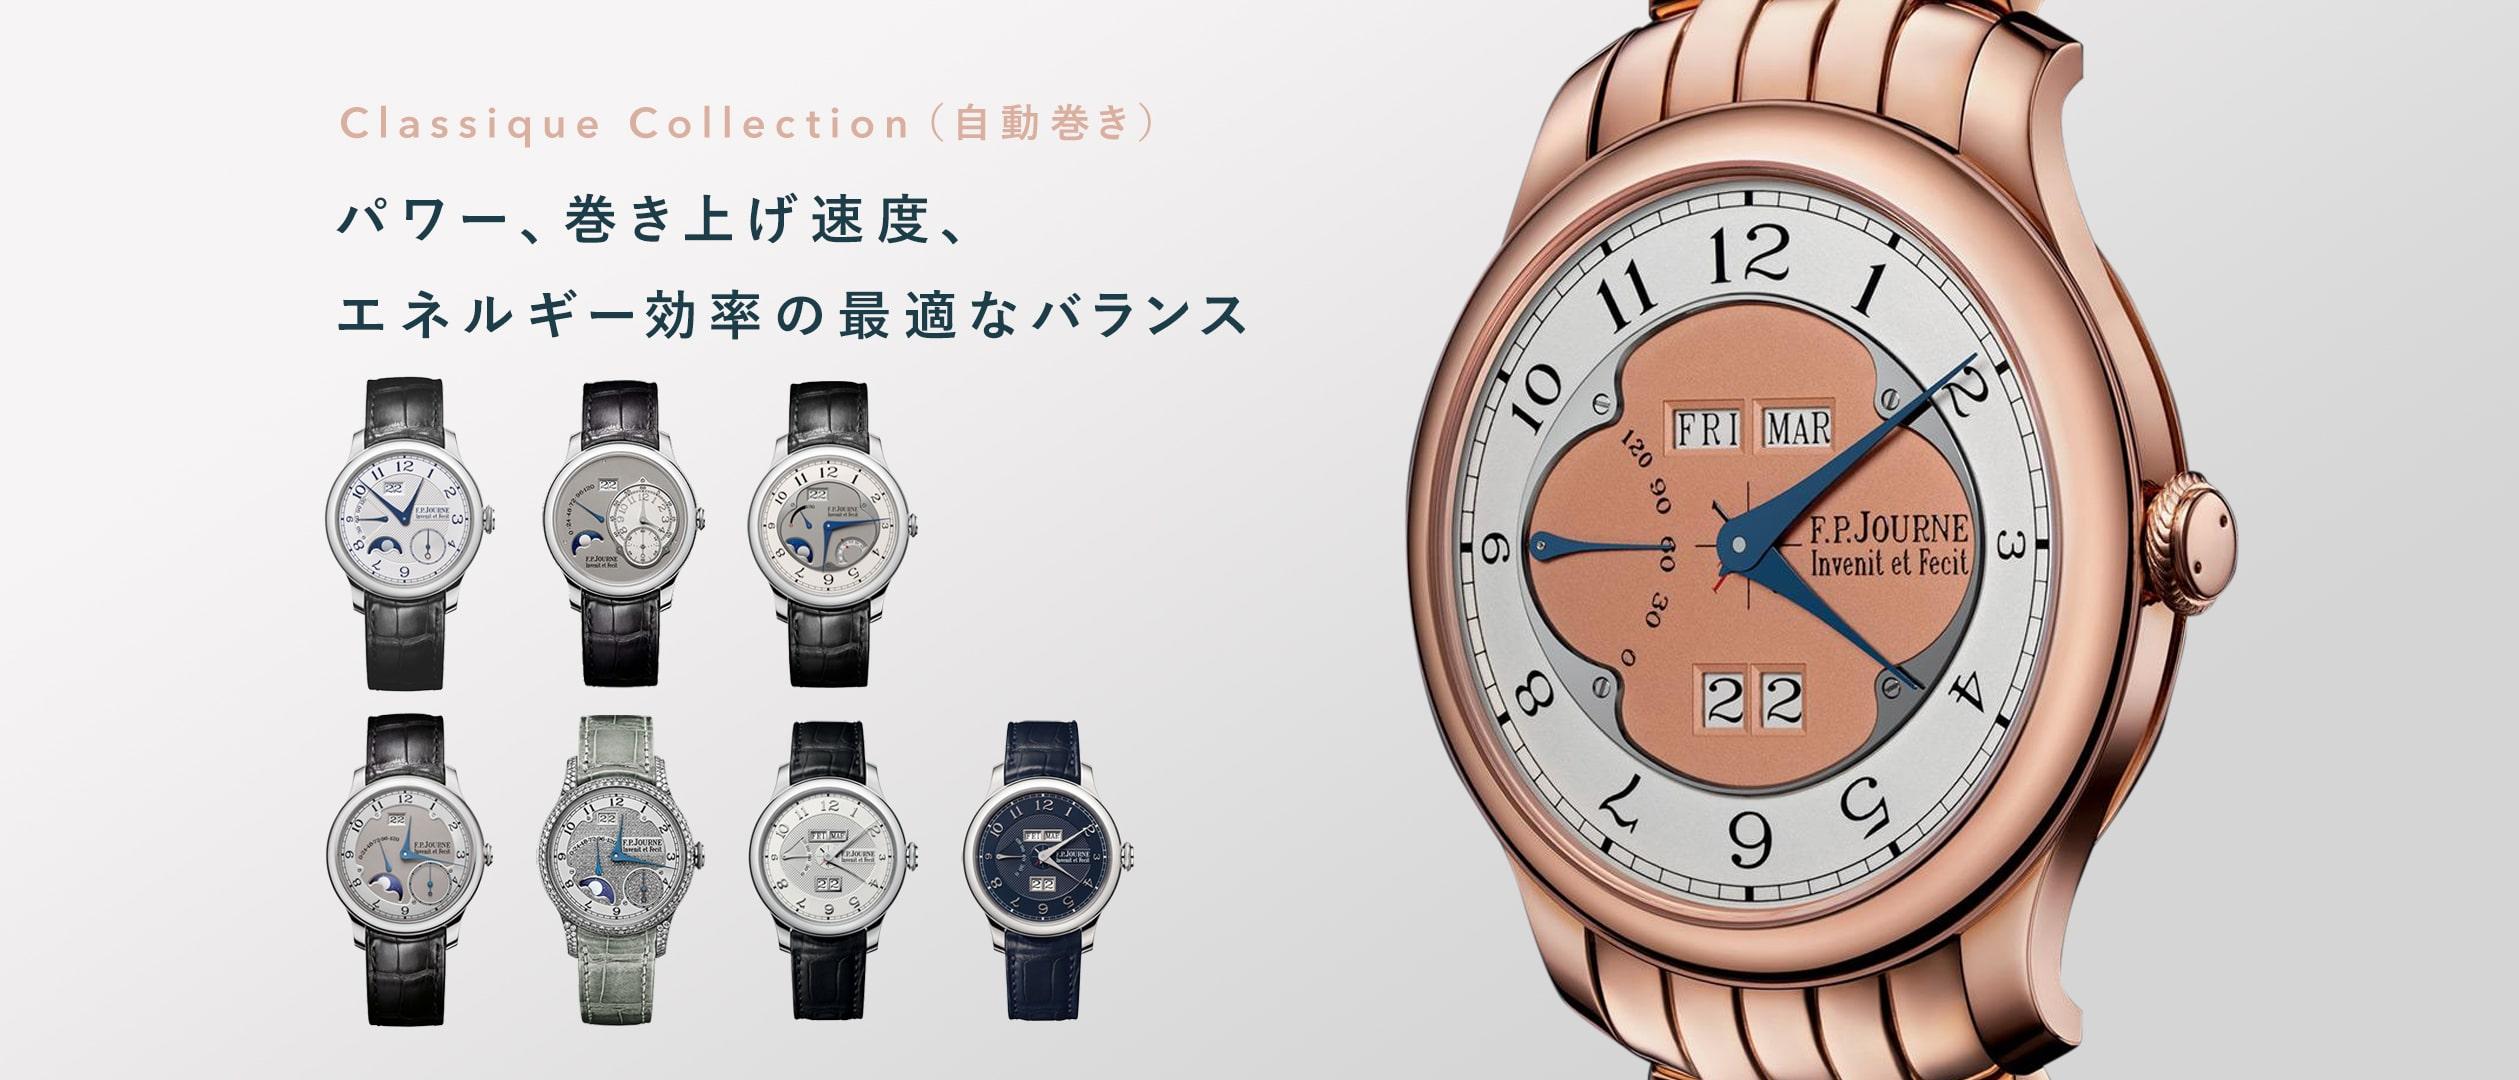 Classique Collection(自動巻き) - パワー、巻き上げ速度、エネルギー効率の最適なバランス